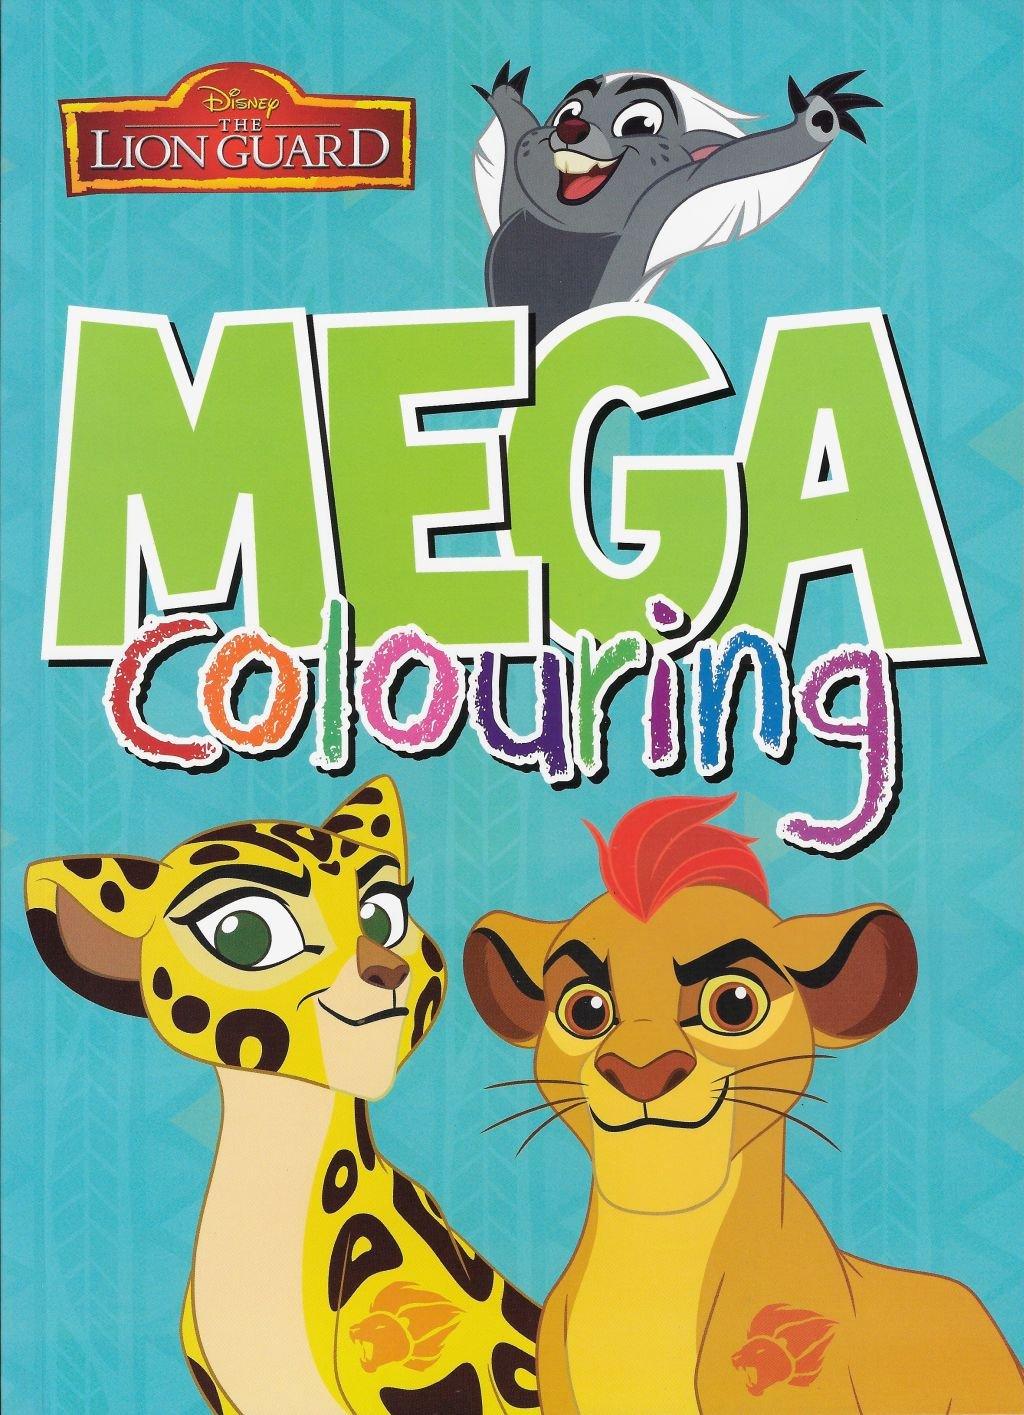 Disney Junior: Der Löwe Guard: Mega Malbuch: Amazon.de: Küche & Haushalt